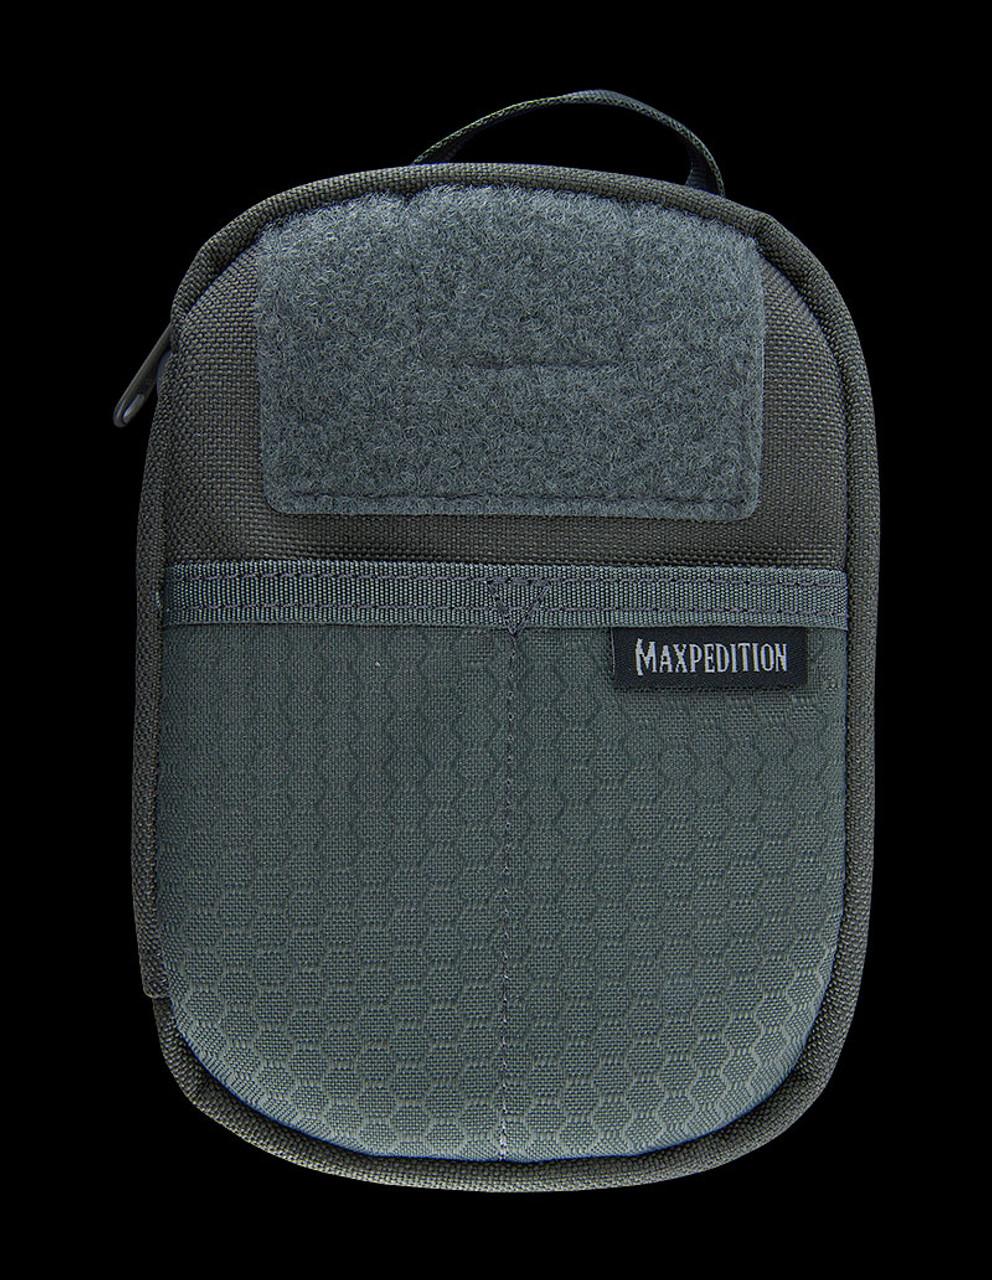 Maxpedition MRZ Mini Organizer V2.0